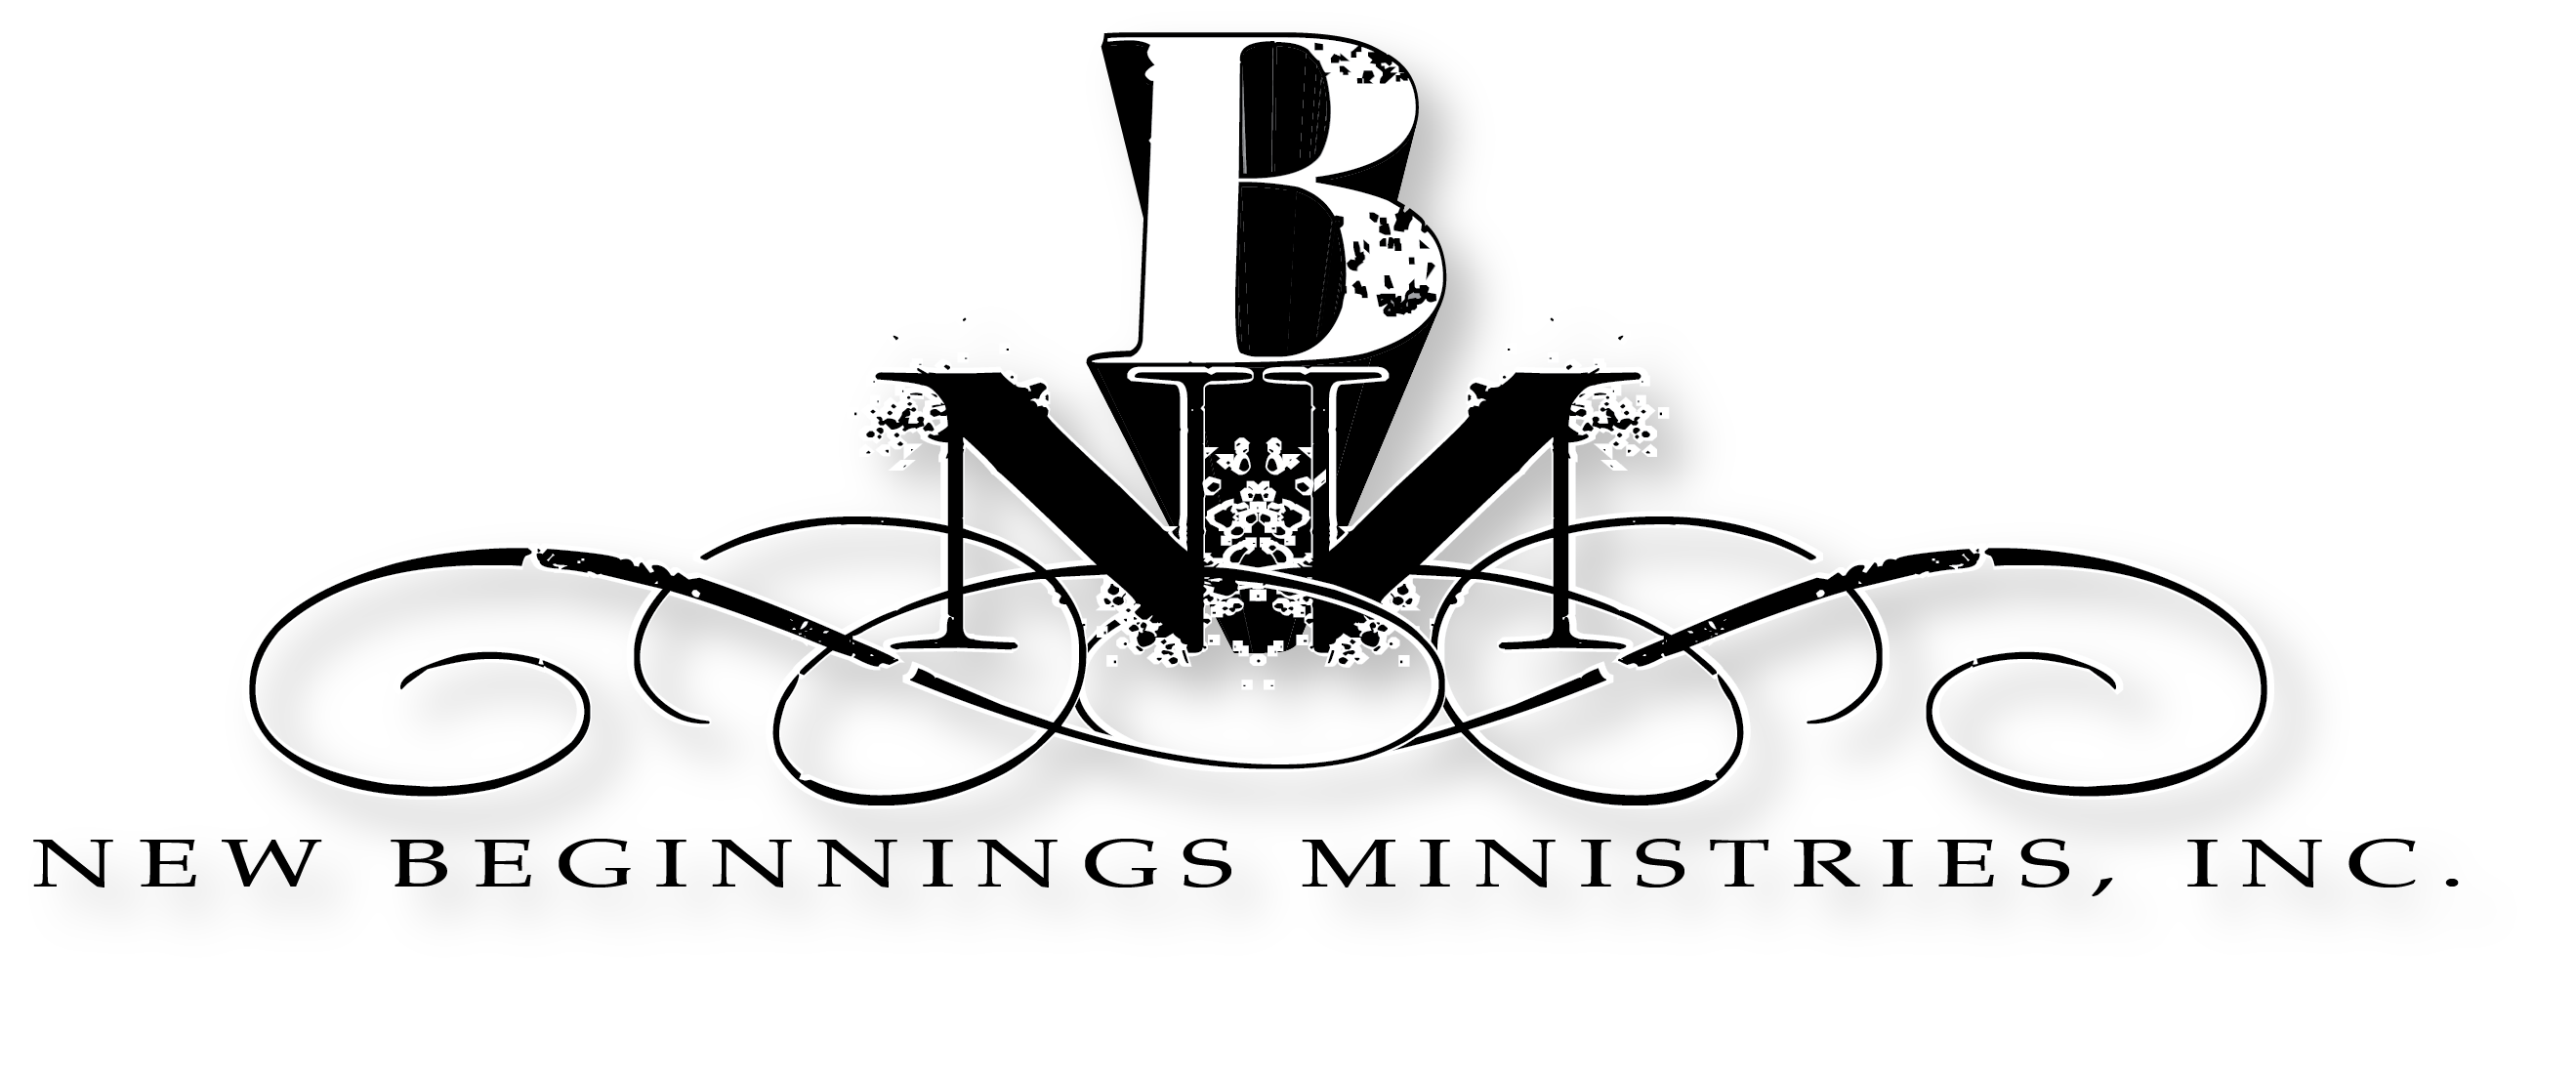 New Beginnings Church Of God In Christ INC